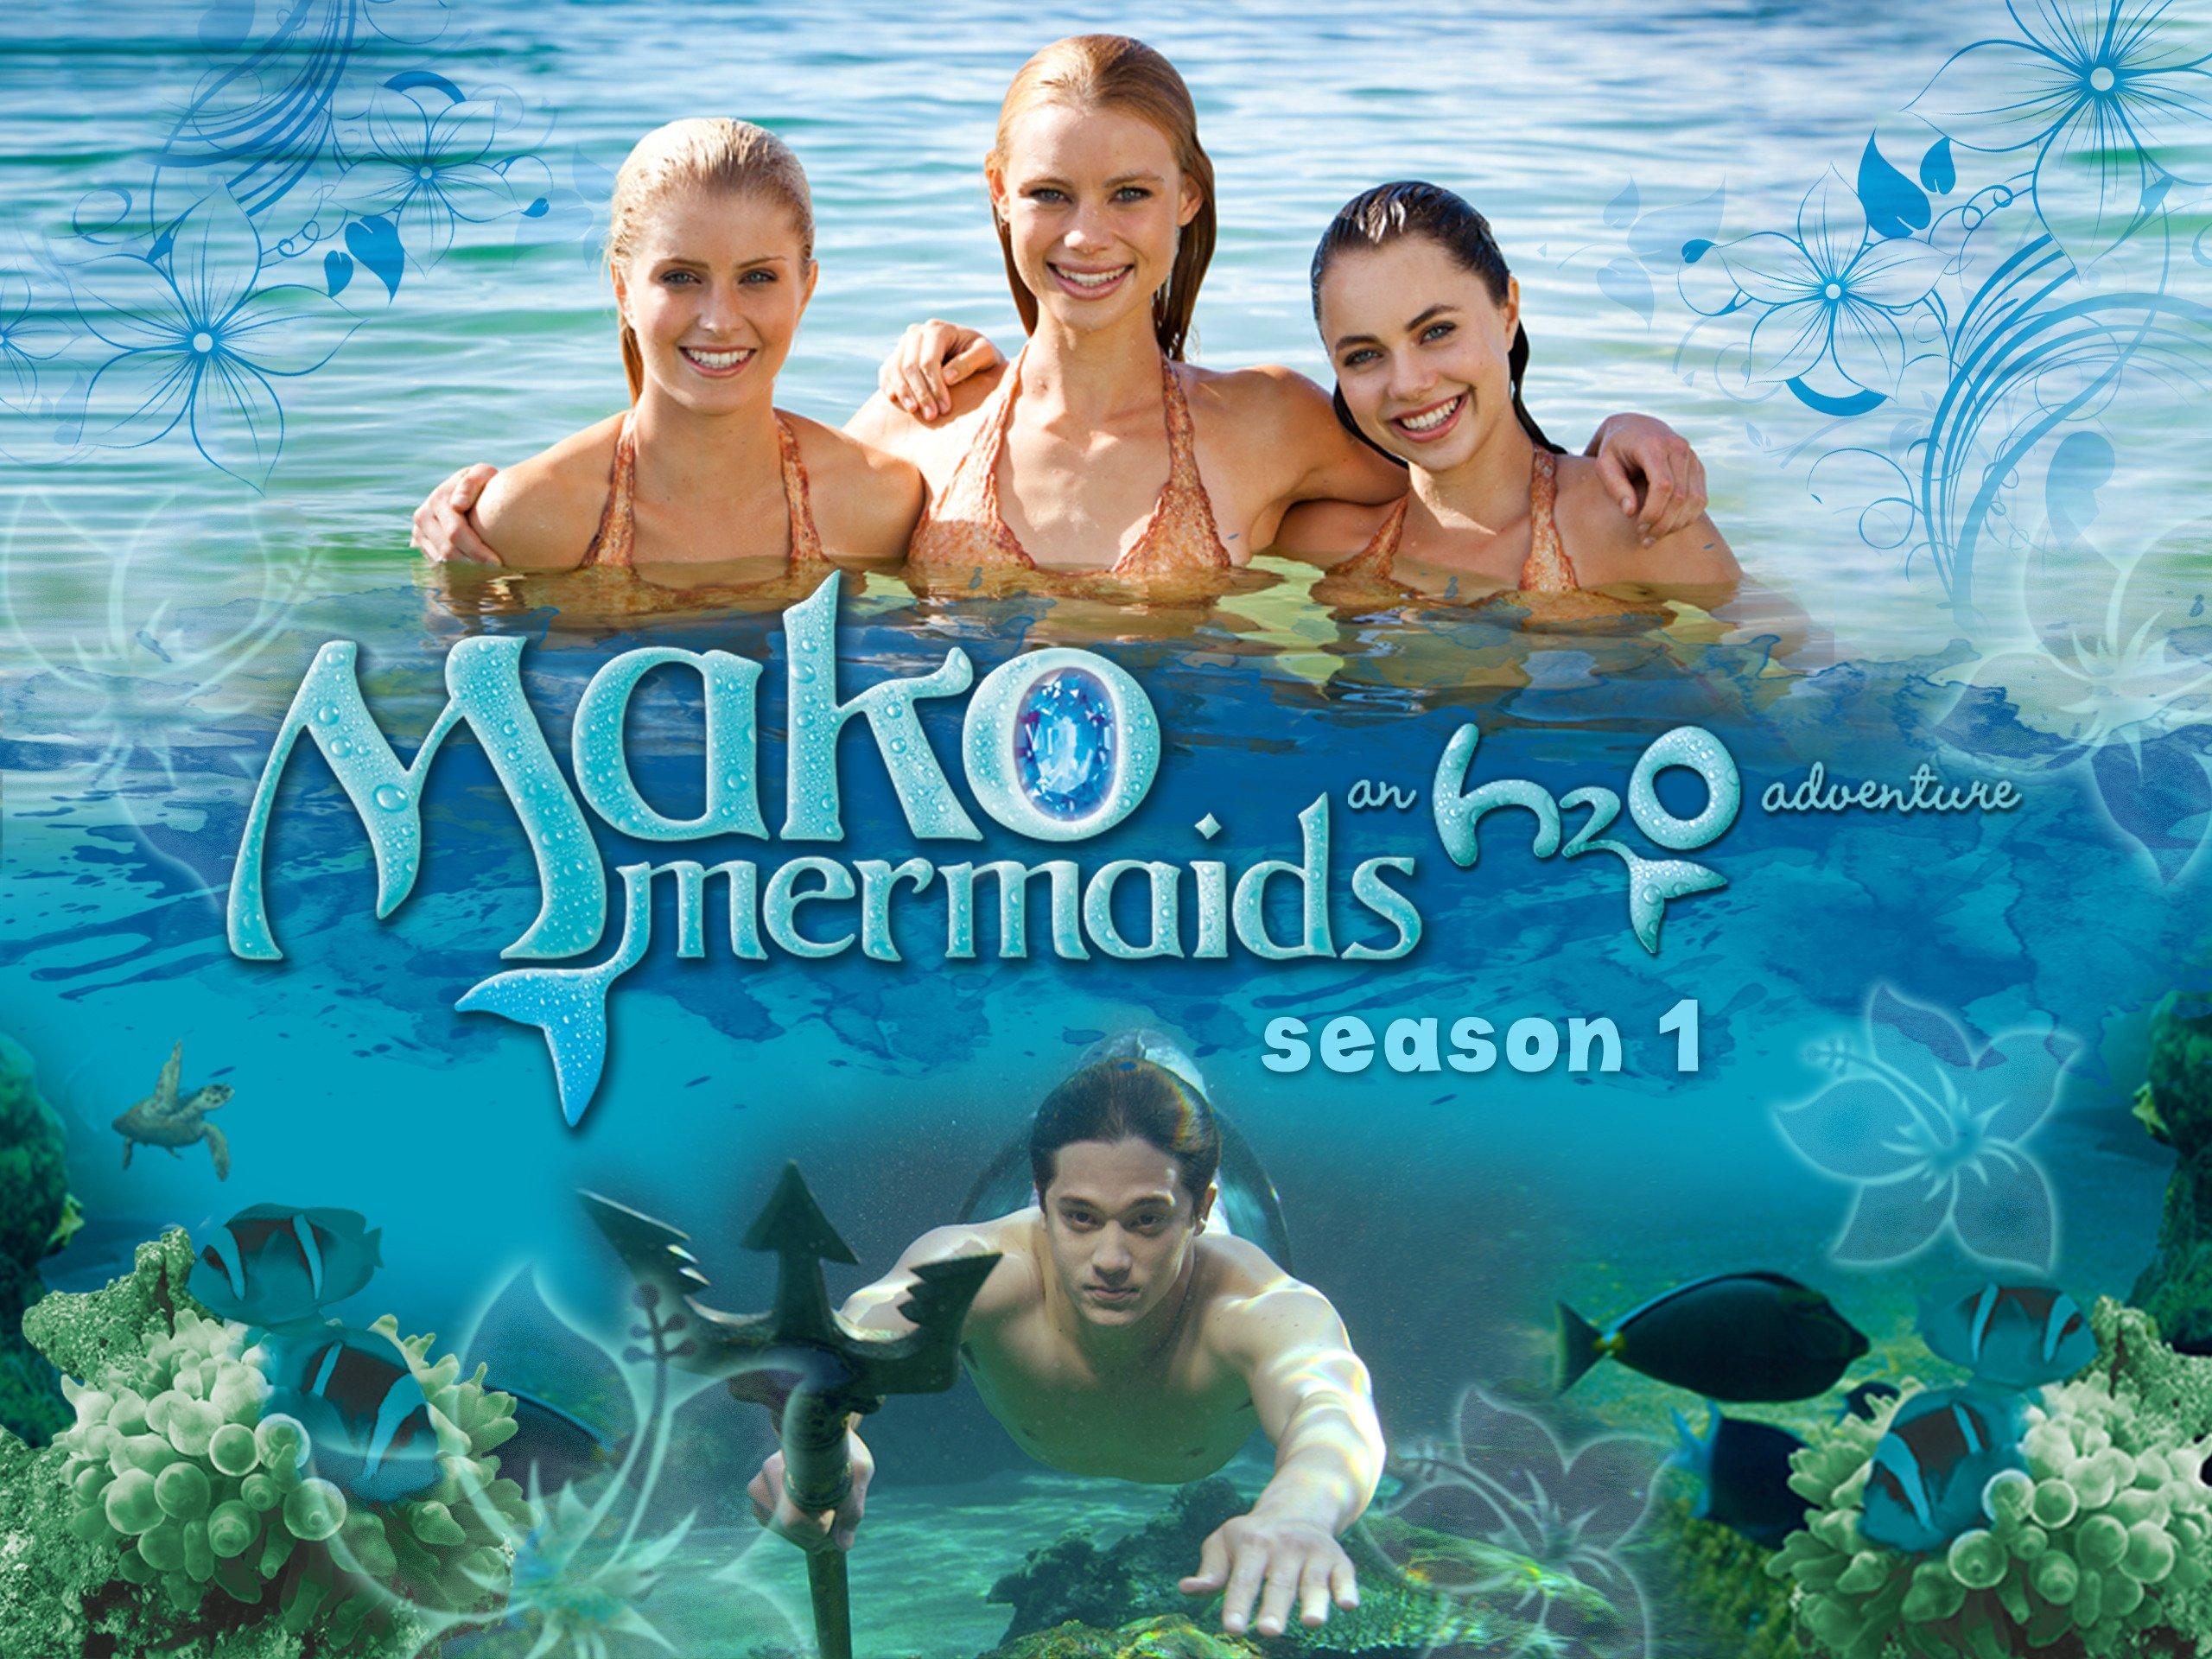 mako mermaids movie 2019 release date